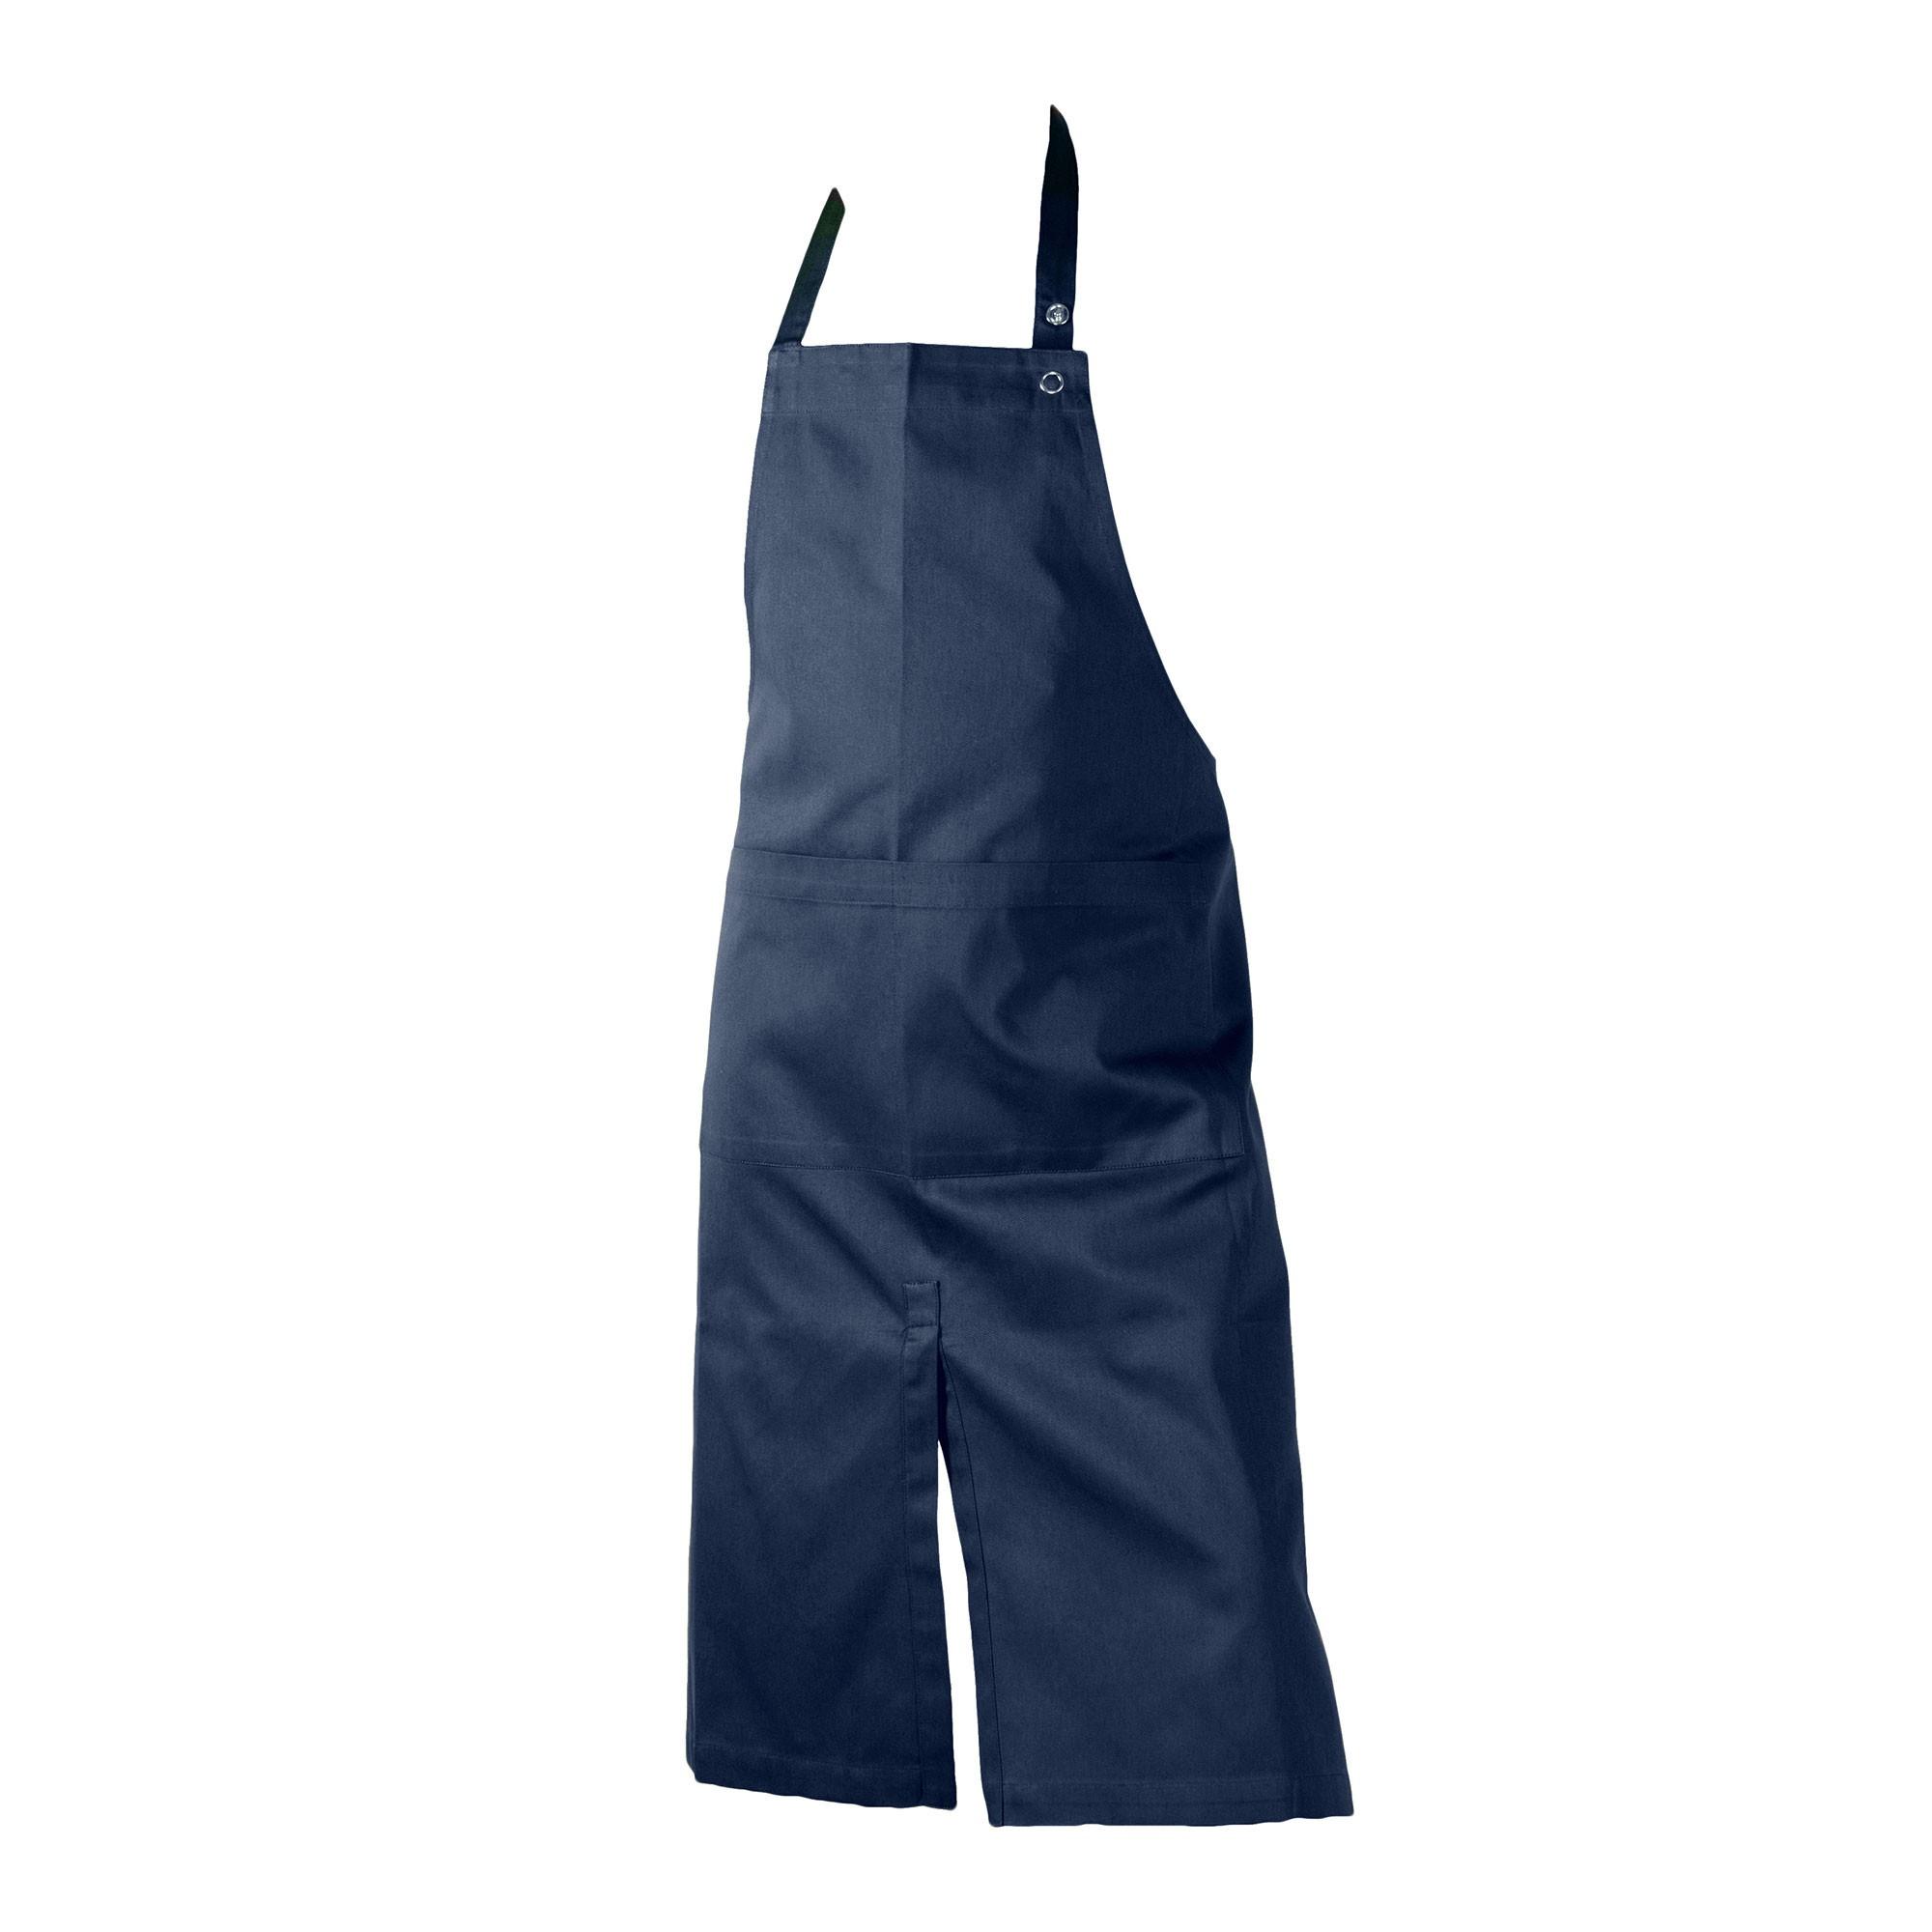 Kuchenschurze The Organic Company Apron With Pocket Dark Blue